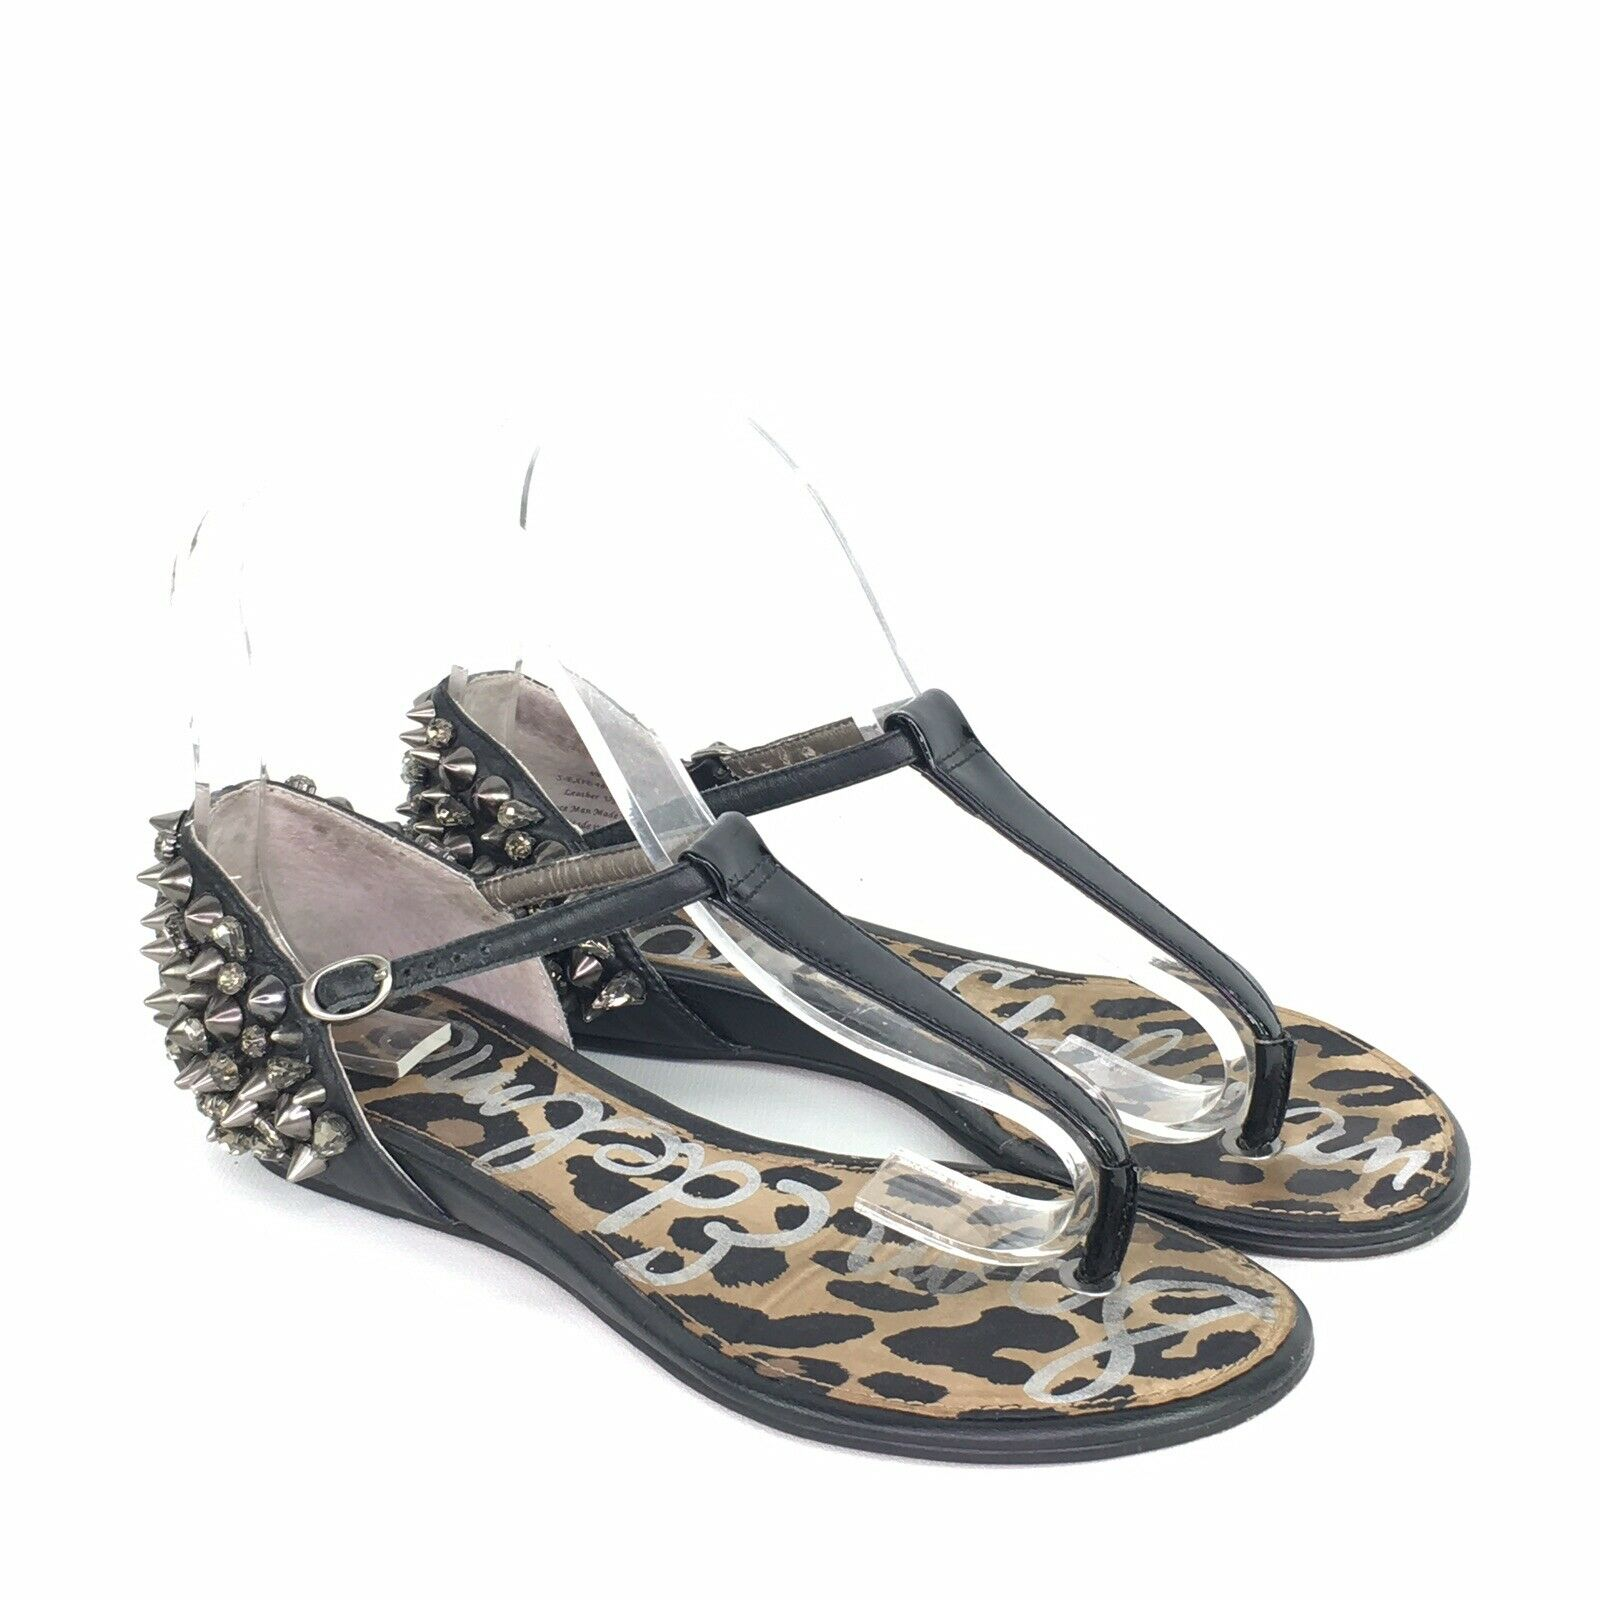 Sam Edelman Black Leather Studded Thong Sandals Womens 6 M